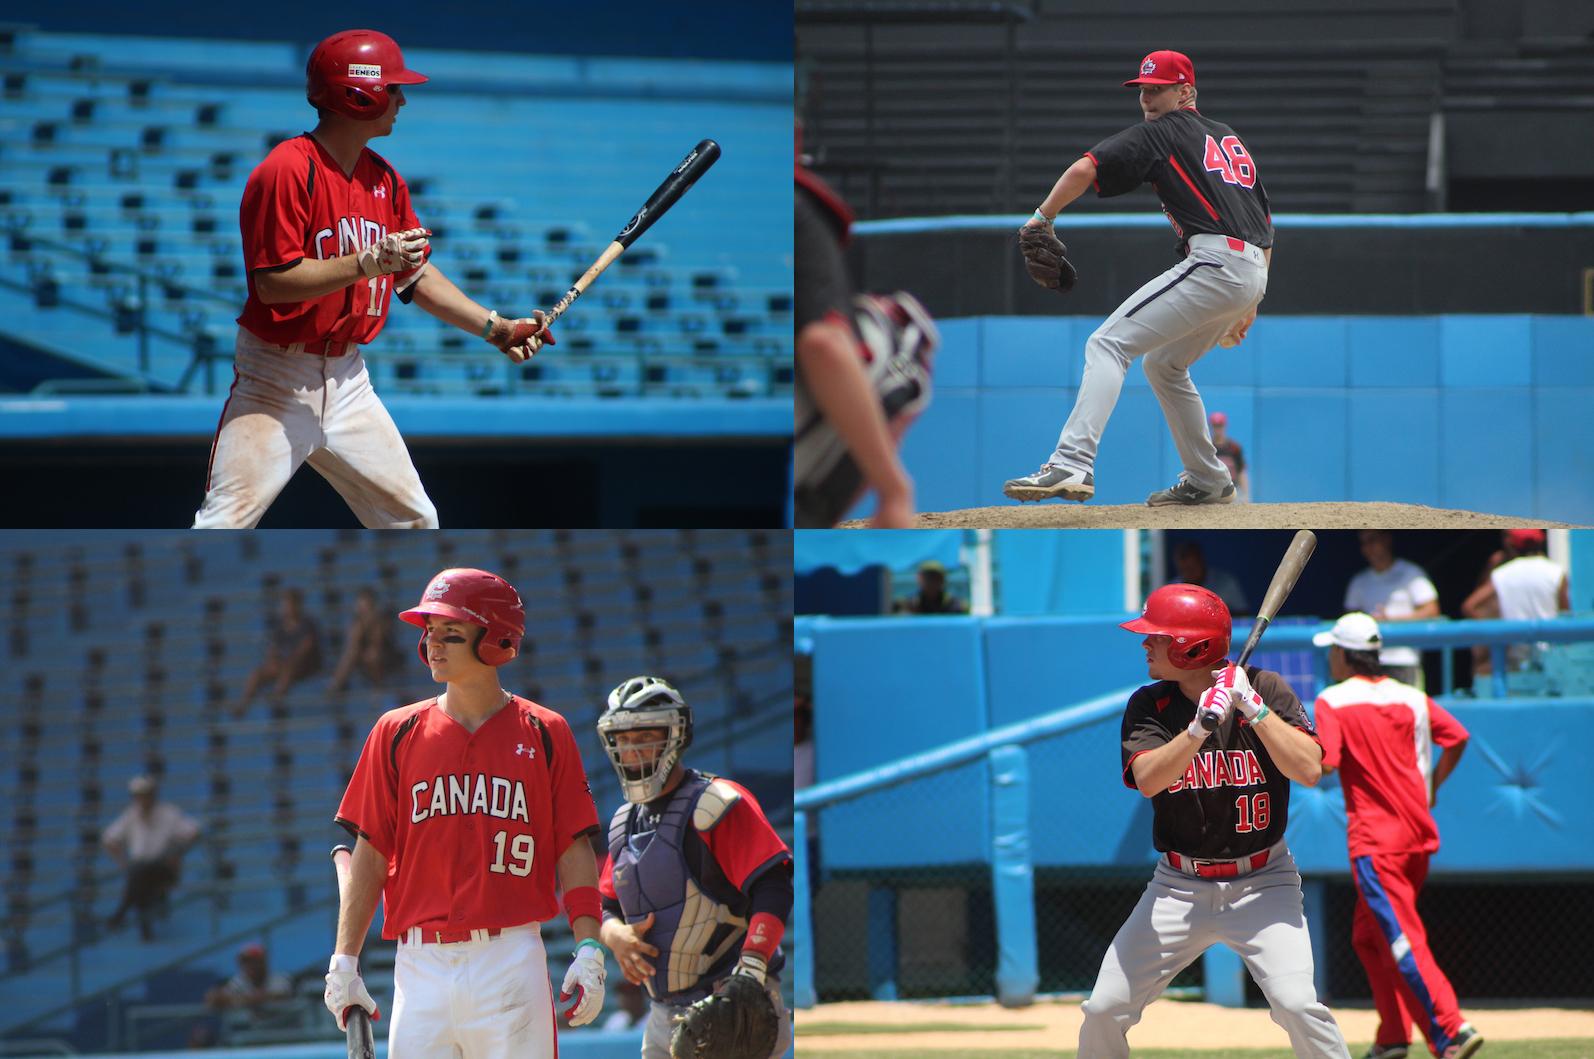 Four Junior National Team players make Baseball America's High School Top 100